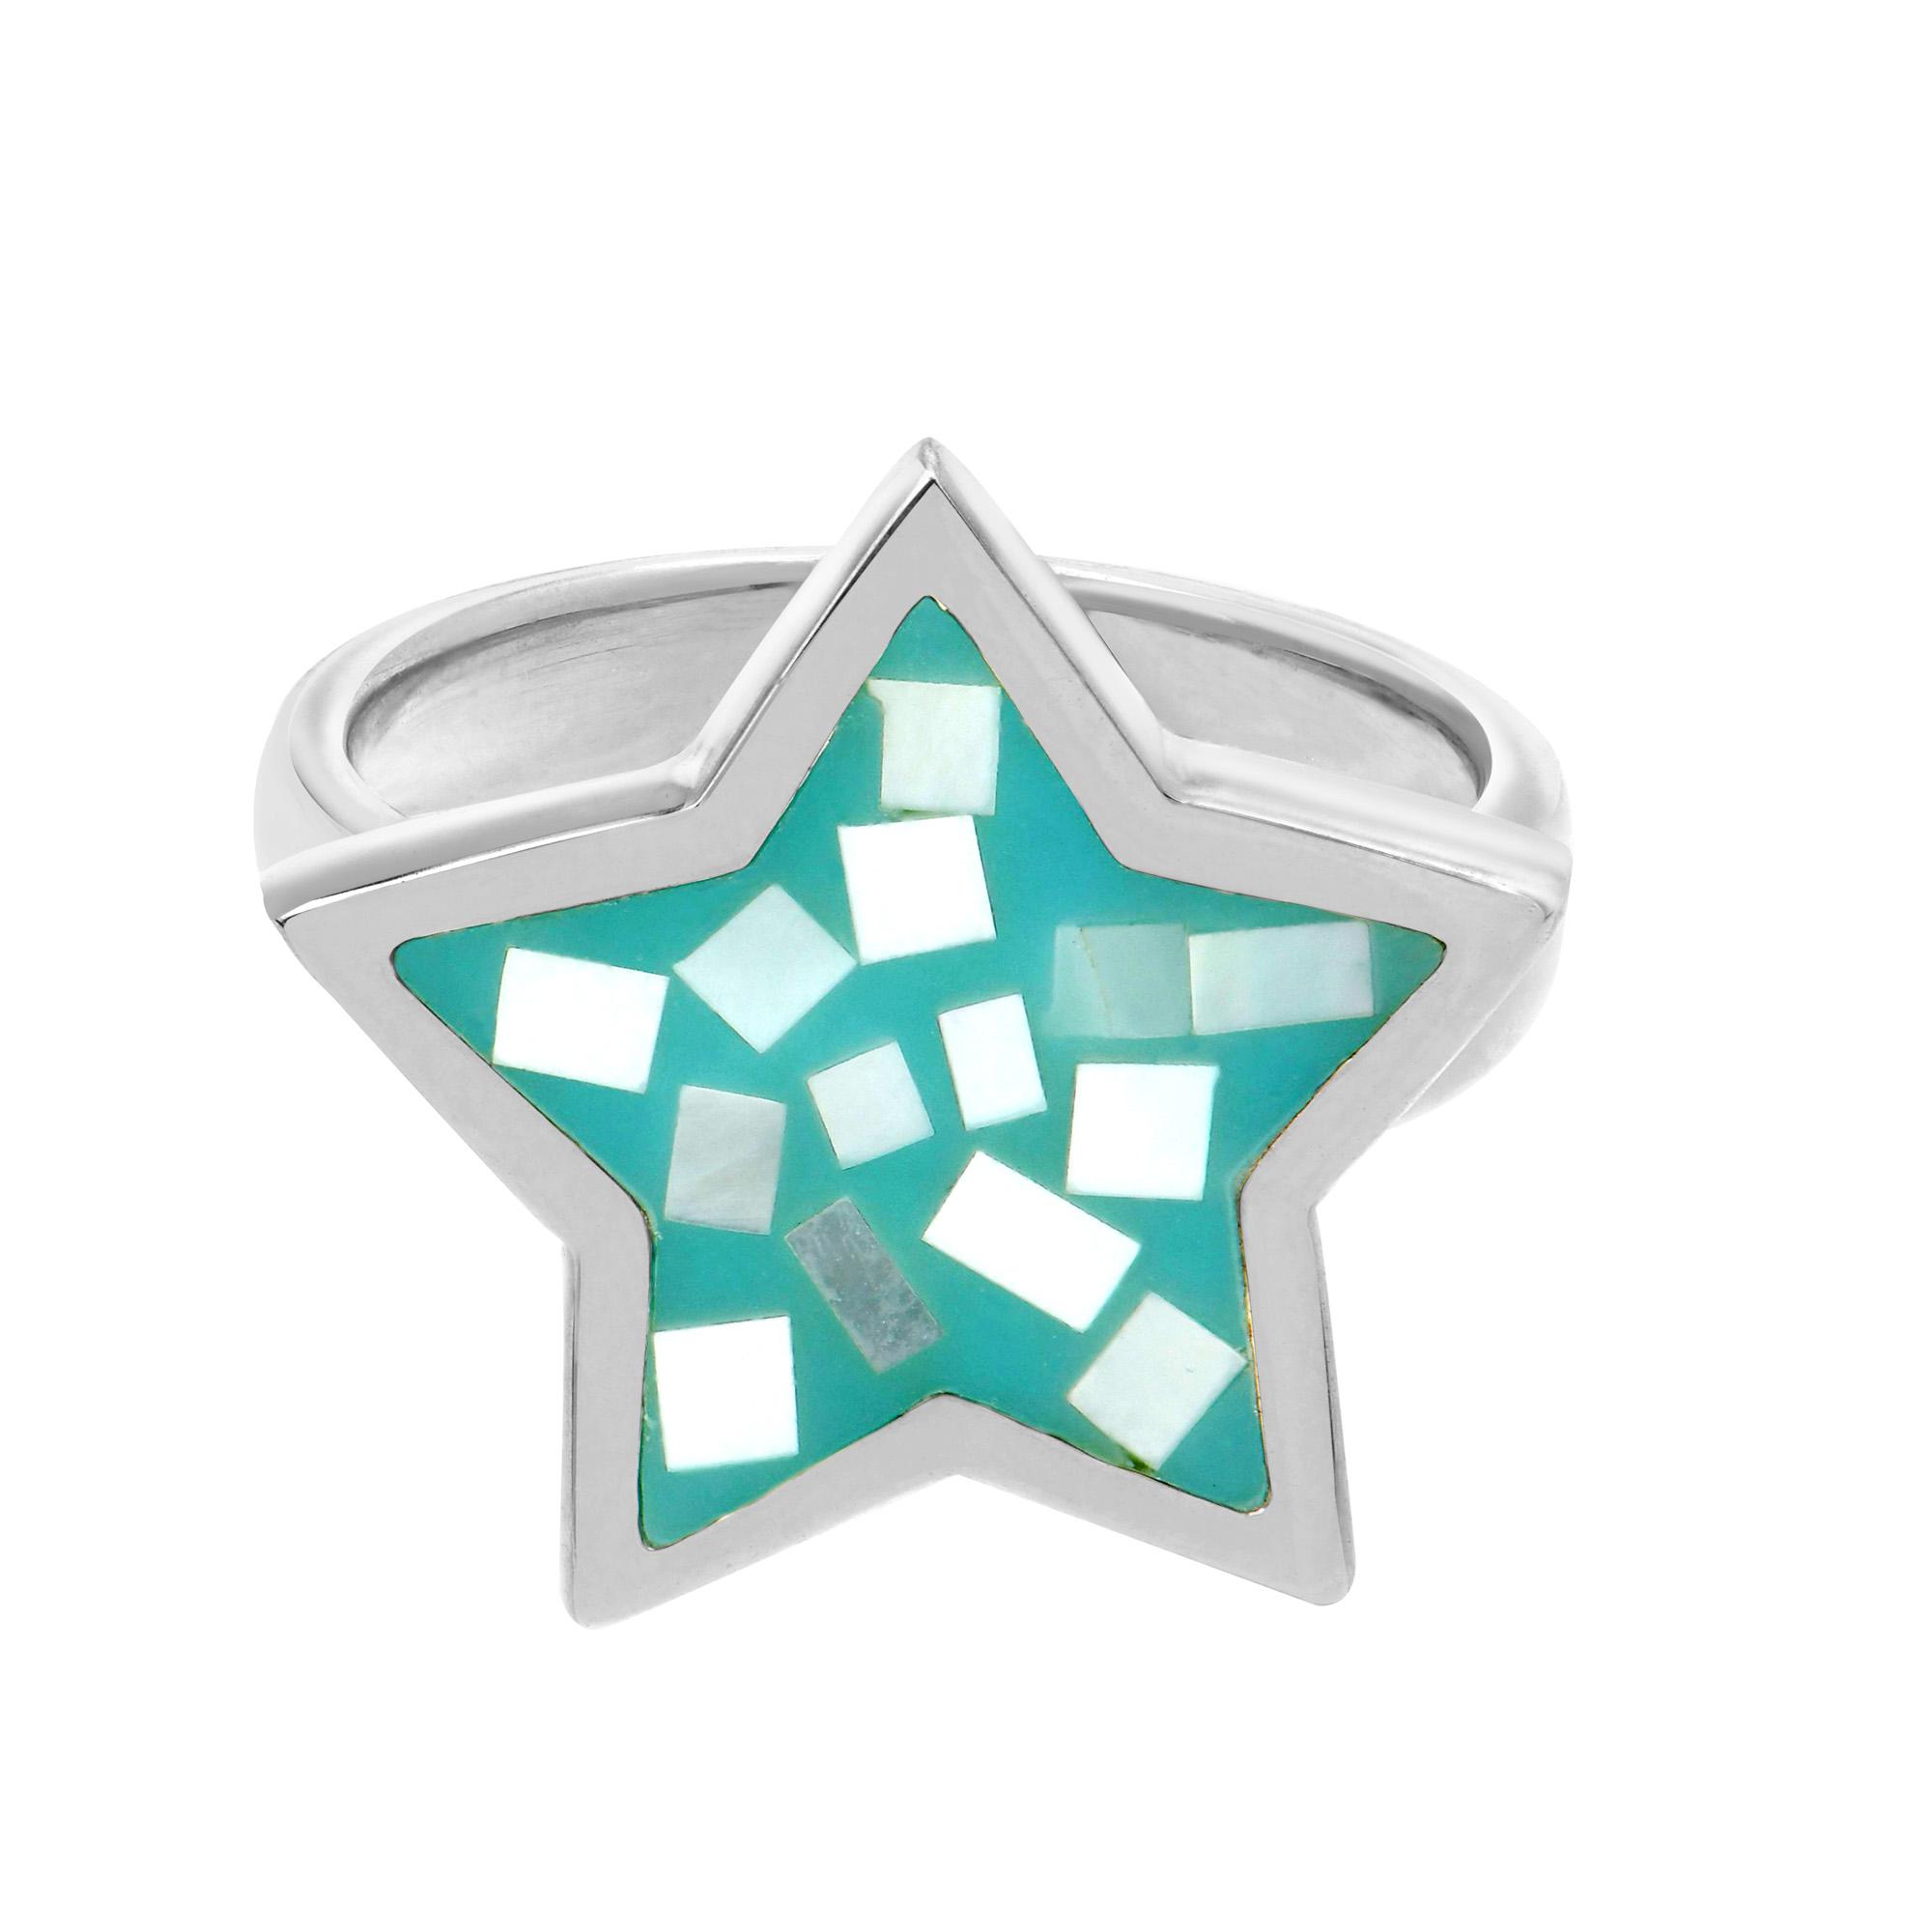 Farbenfrohe Perlen Ohrhänger Polaris Effektperlen 12 mm Farbe frei wählbar